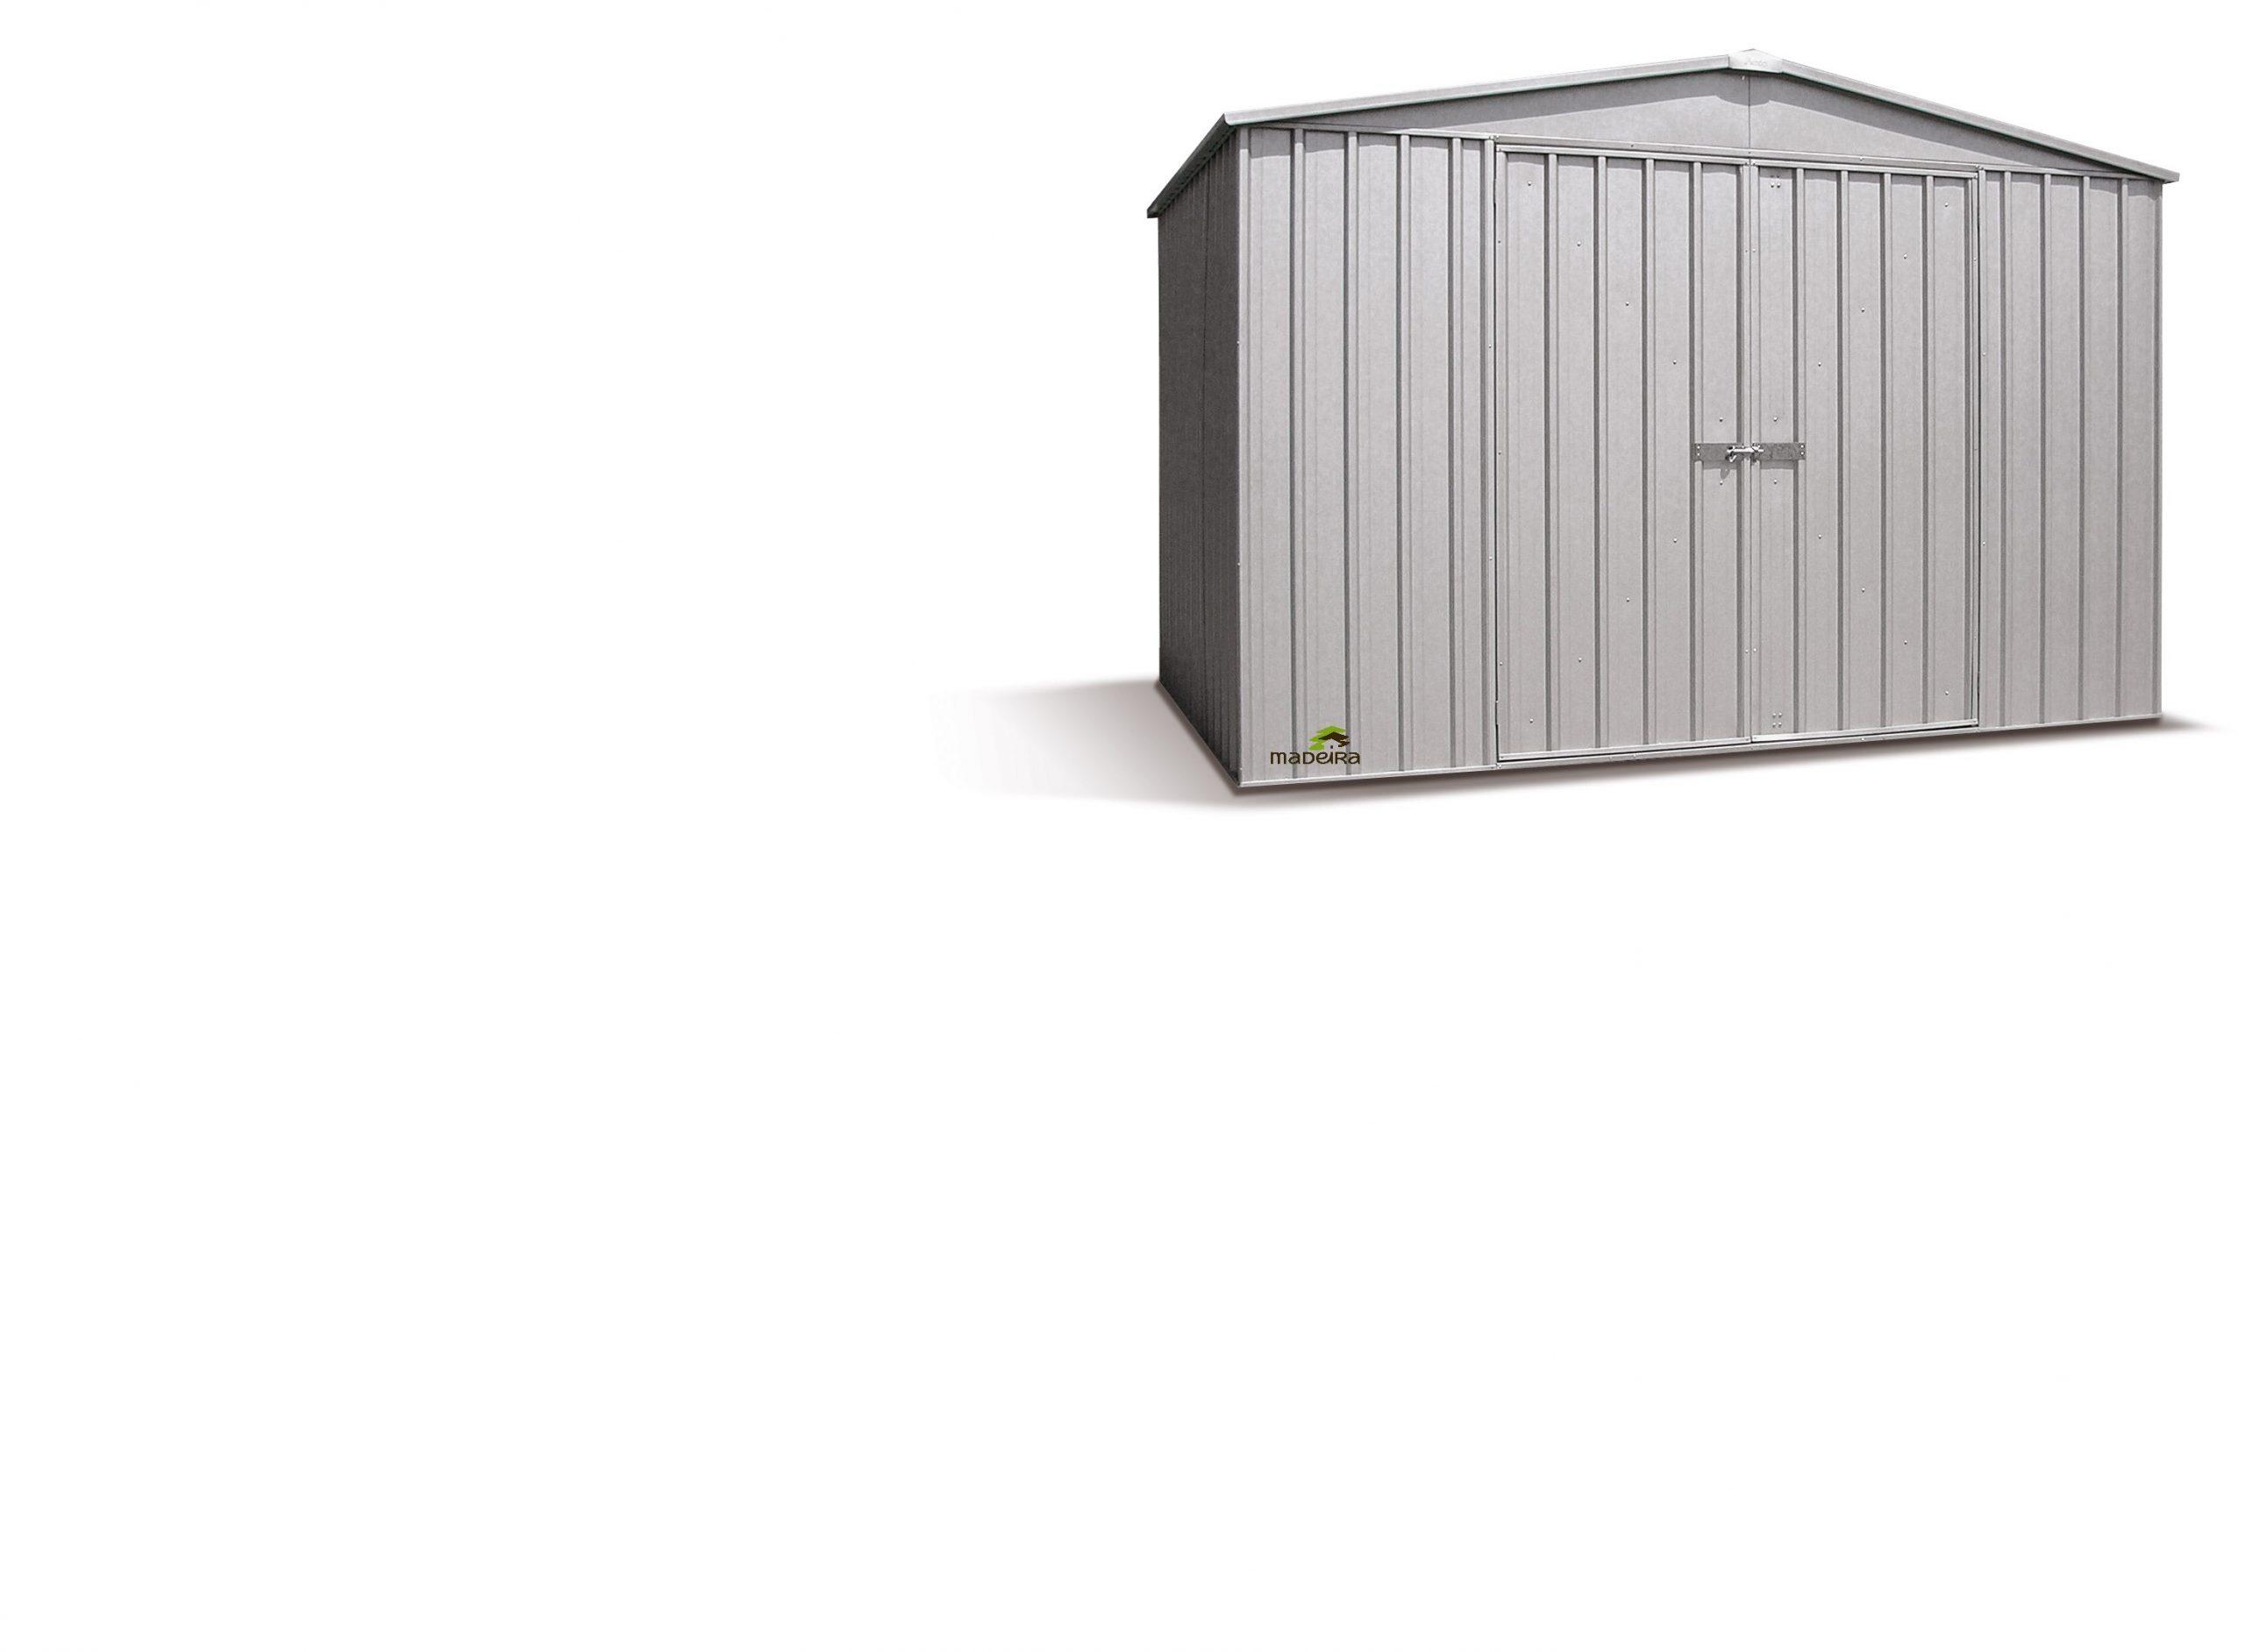 Abri Metal Ref. Barkly Silver Grey, 6.54M², 300 X 218 Cm ... serapportantà Montage Abri De Jardin Metal